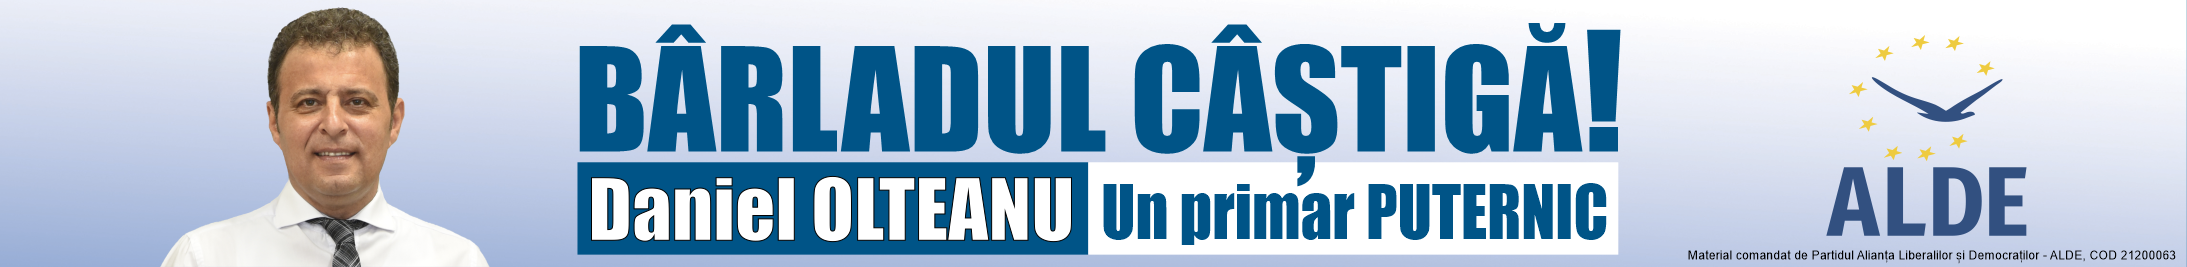 https://estnews.ro/wp-content/uploads/2020/08/Banner-Impreuna-pentru-Barlad-2184-x-267.png